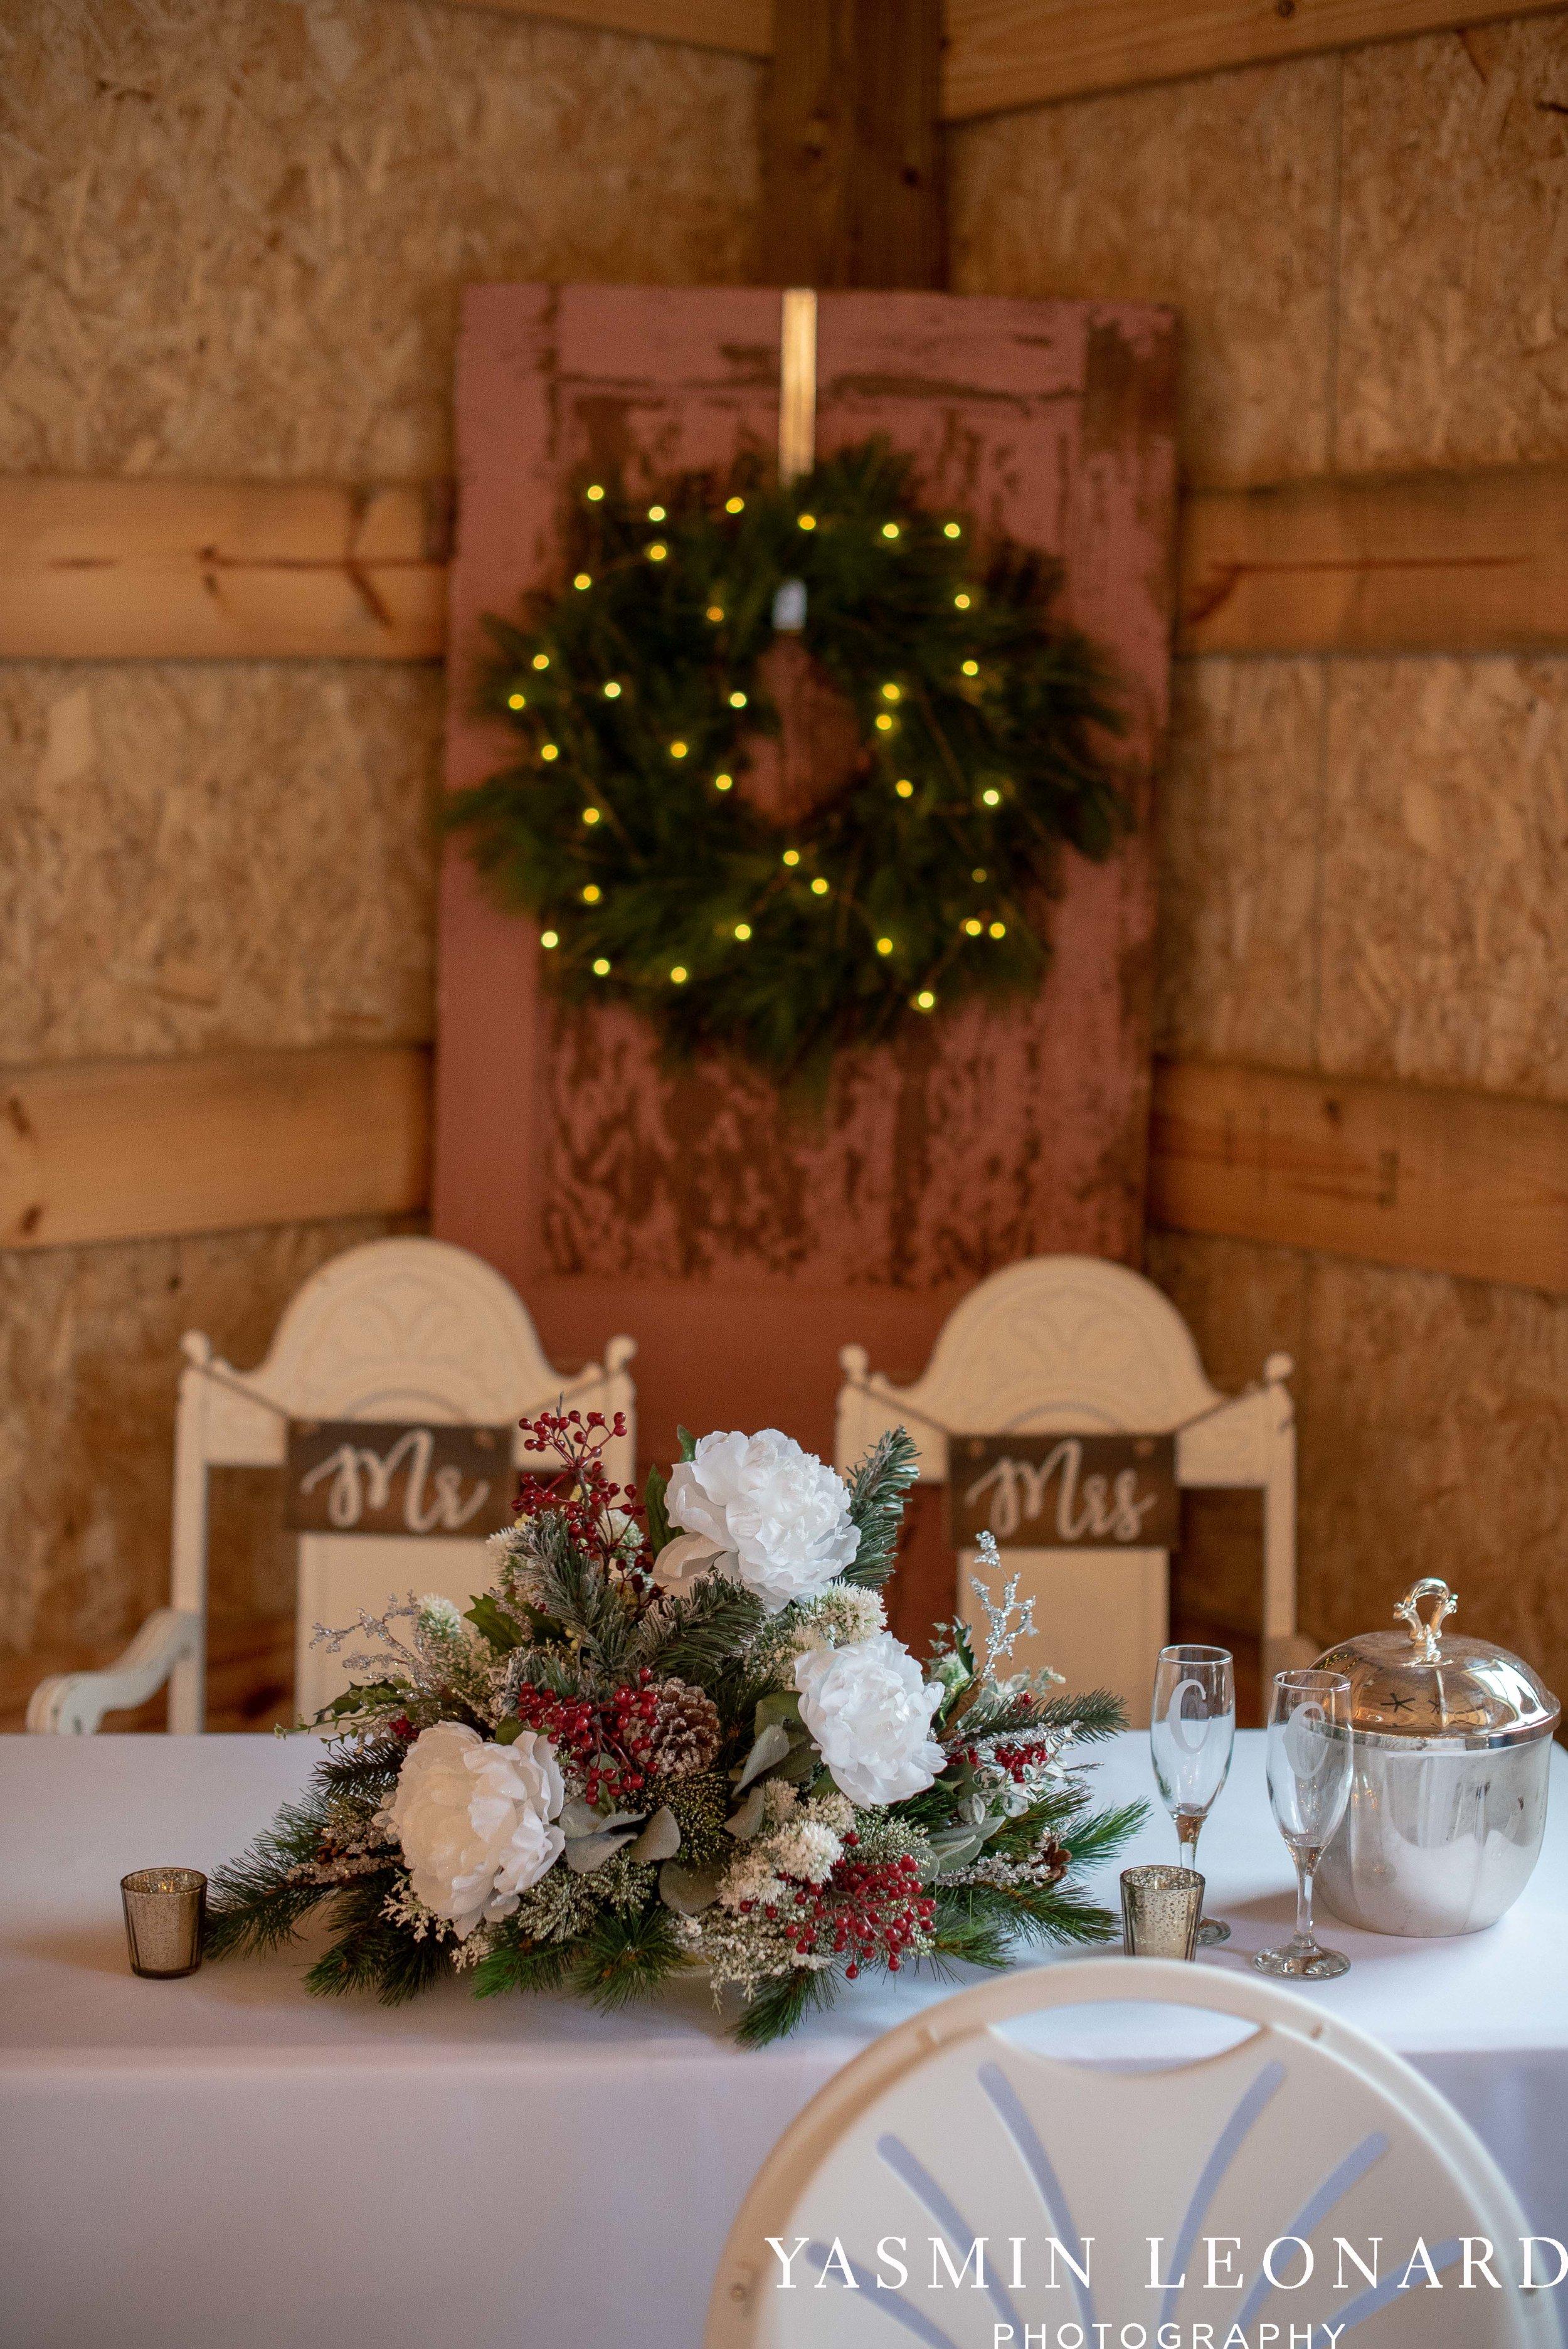 Secret Meadows at Green Dell Farm, NC Barns, NC Wedding Venues, Triad, NC, NC Wedding Photography, Triad Wedding Venues, Affordable Wedding Venues, NEW Wedding Venues, Christmas Weddings-5.jpg